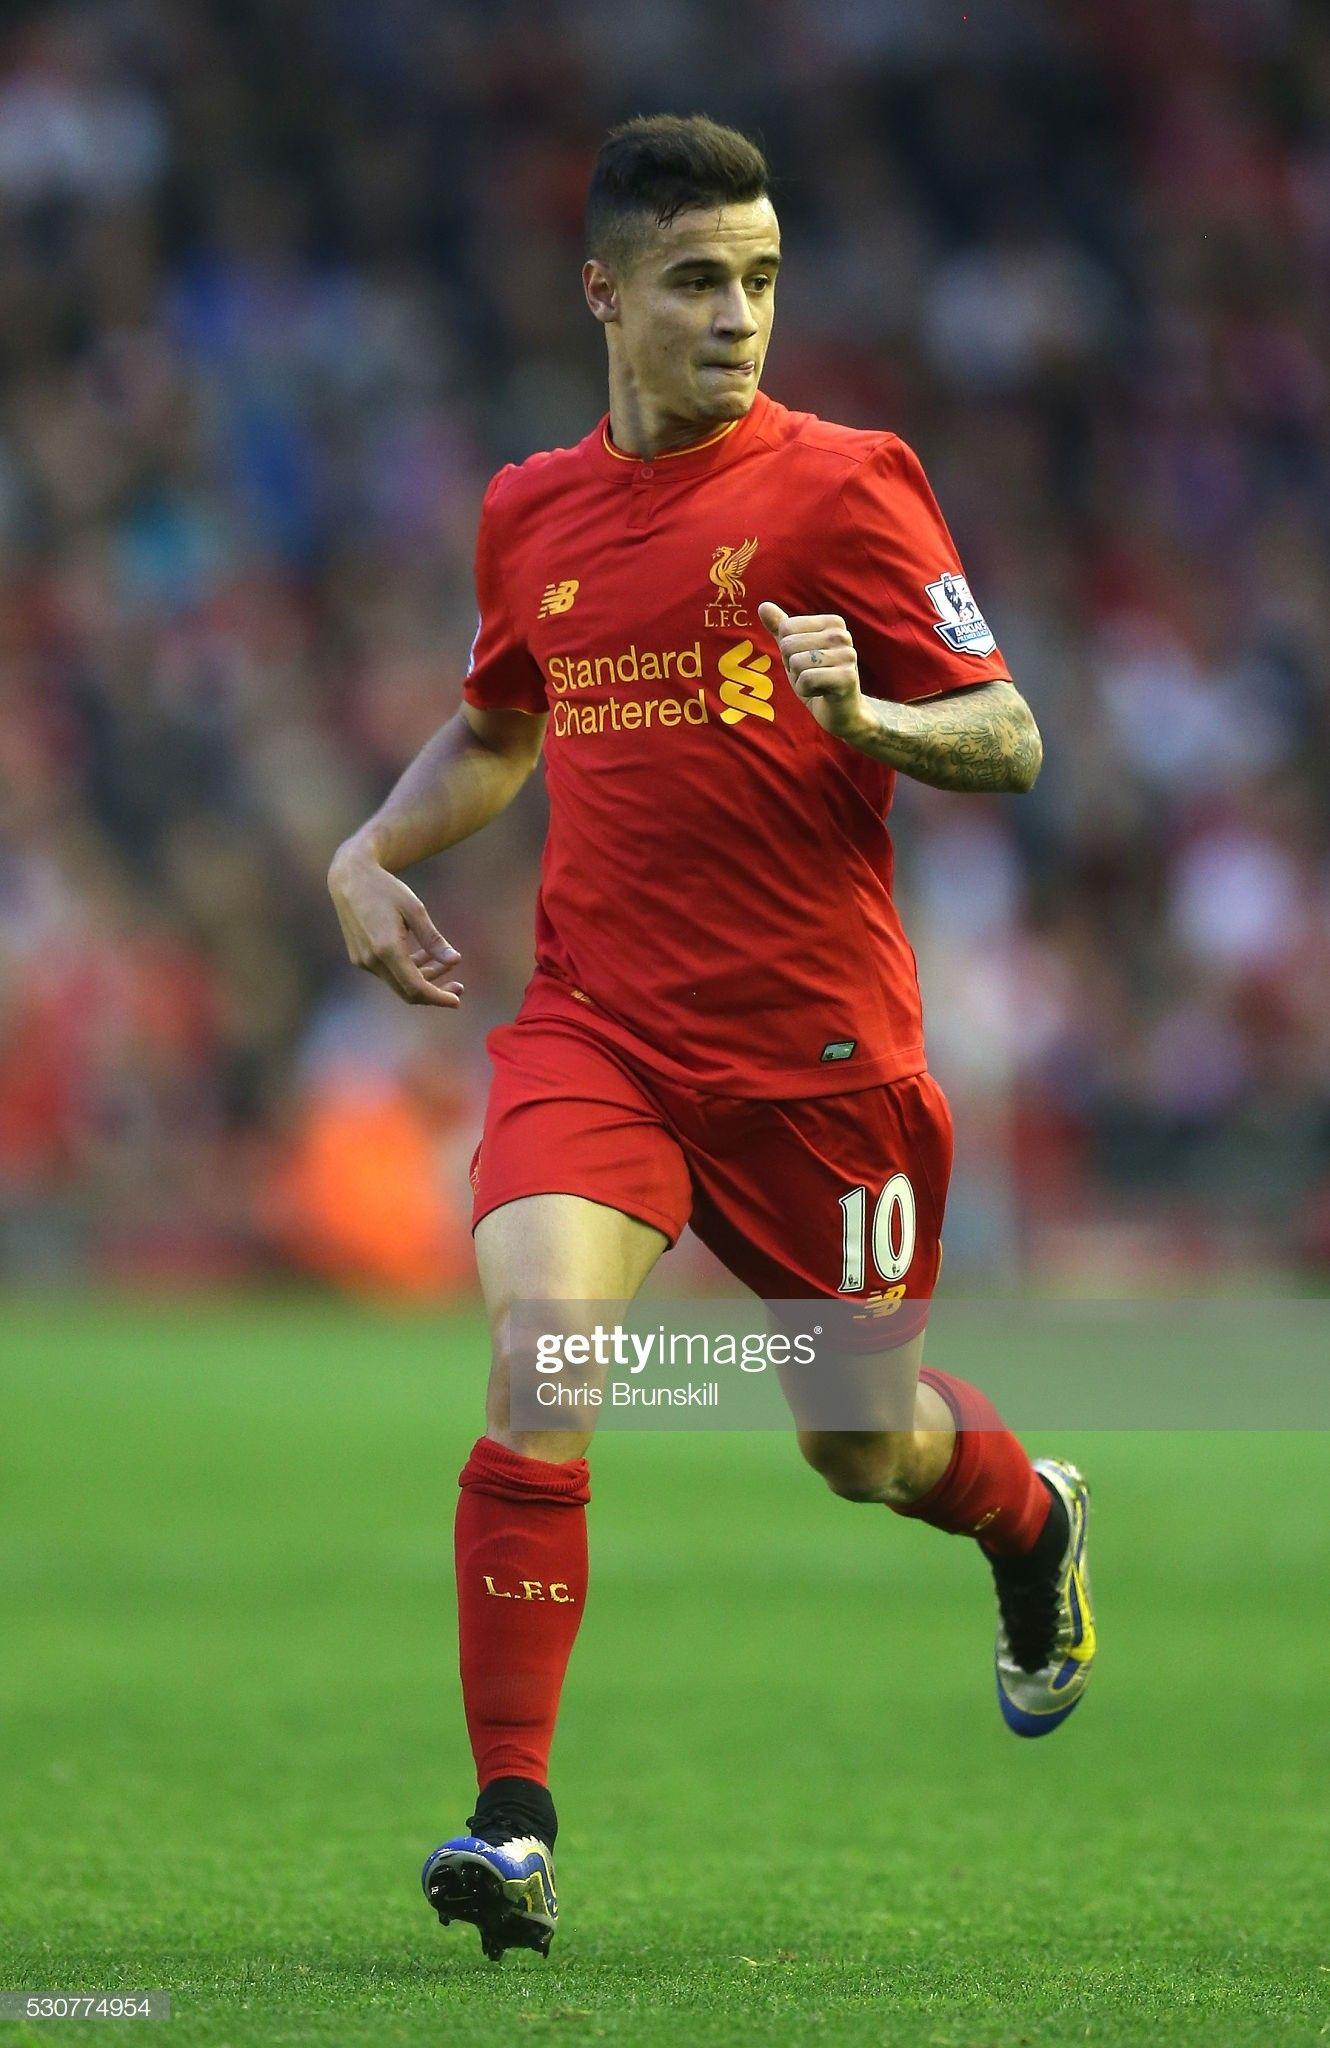 LFC Live - Liverpool FC News - Liverpool transfer round-up